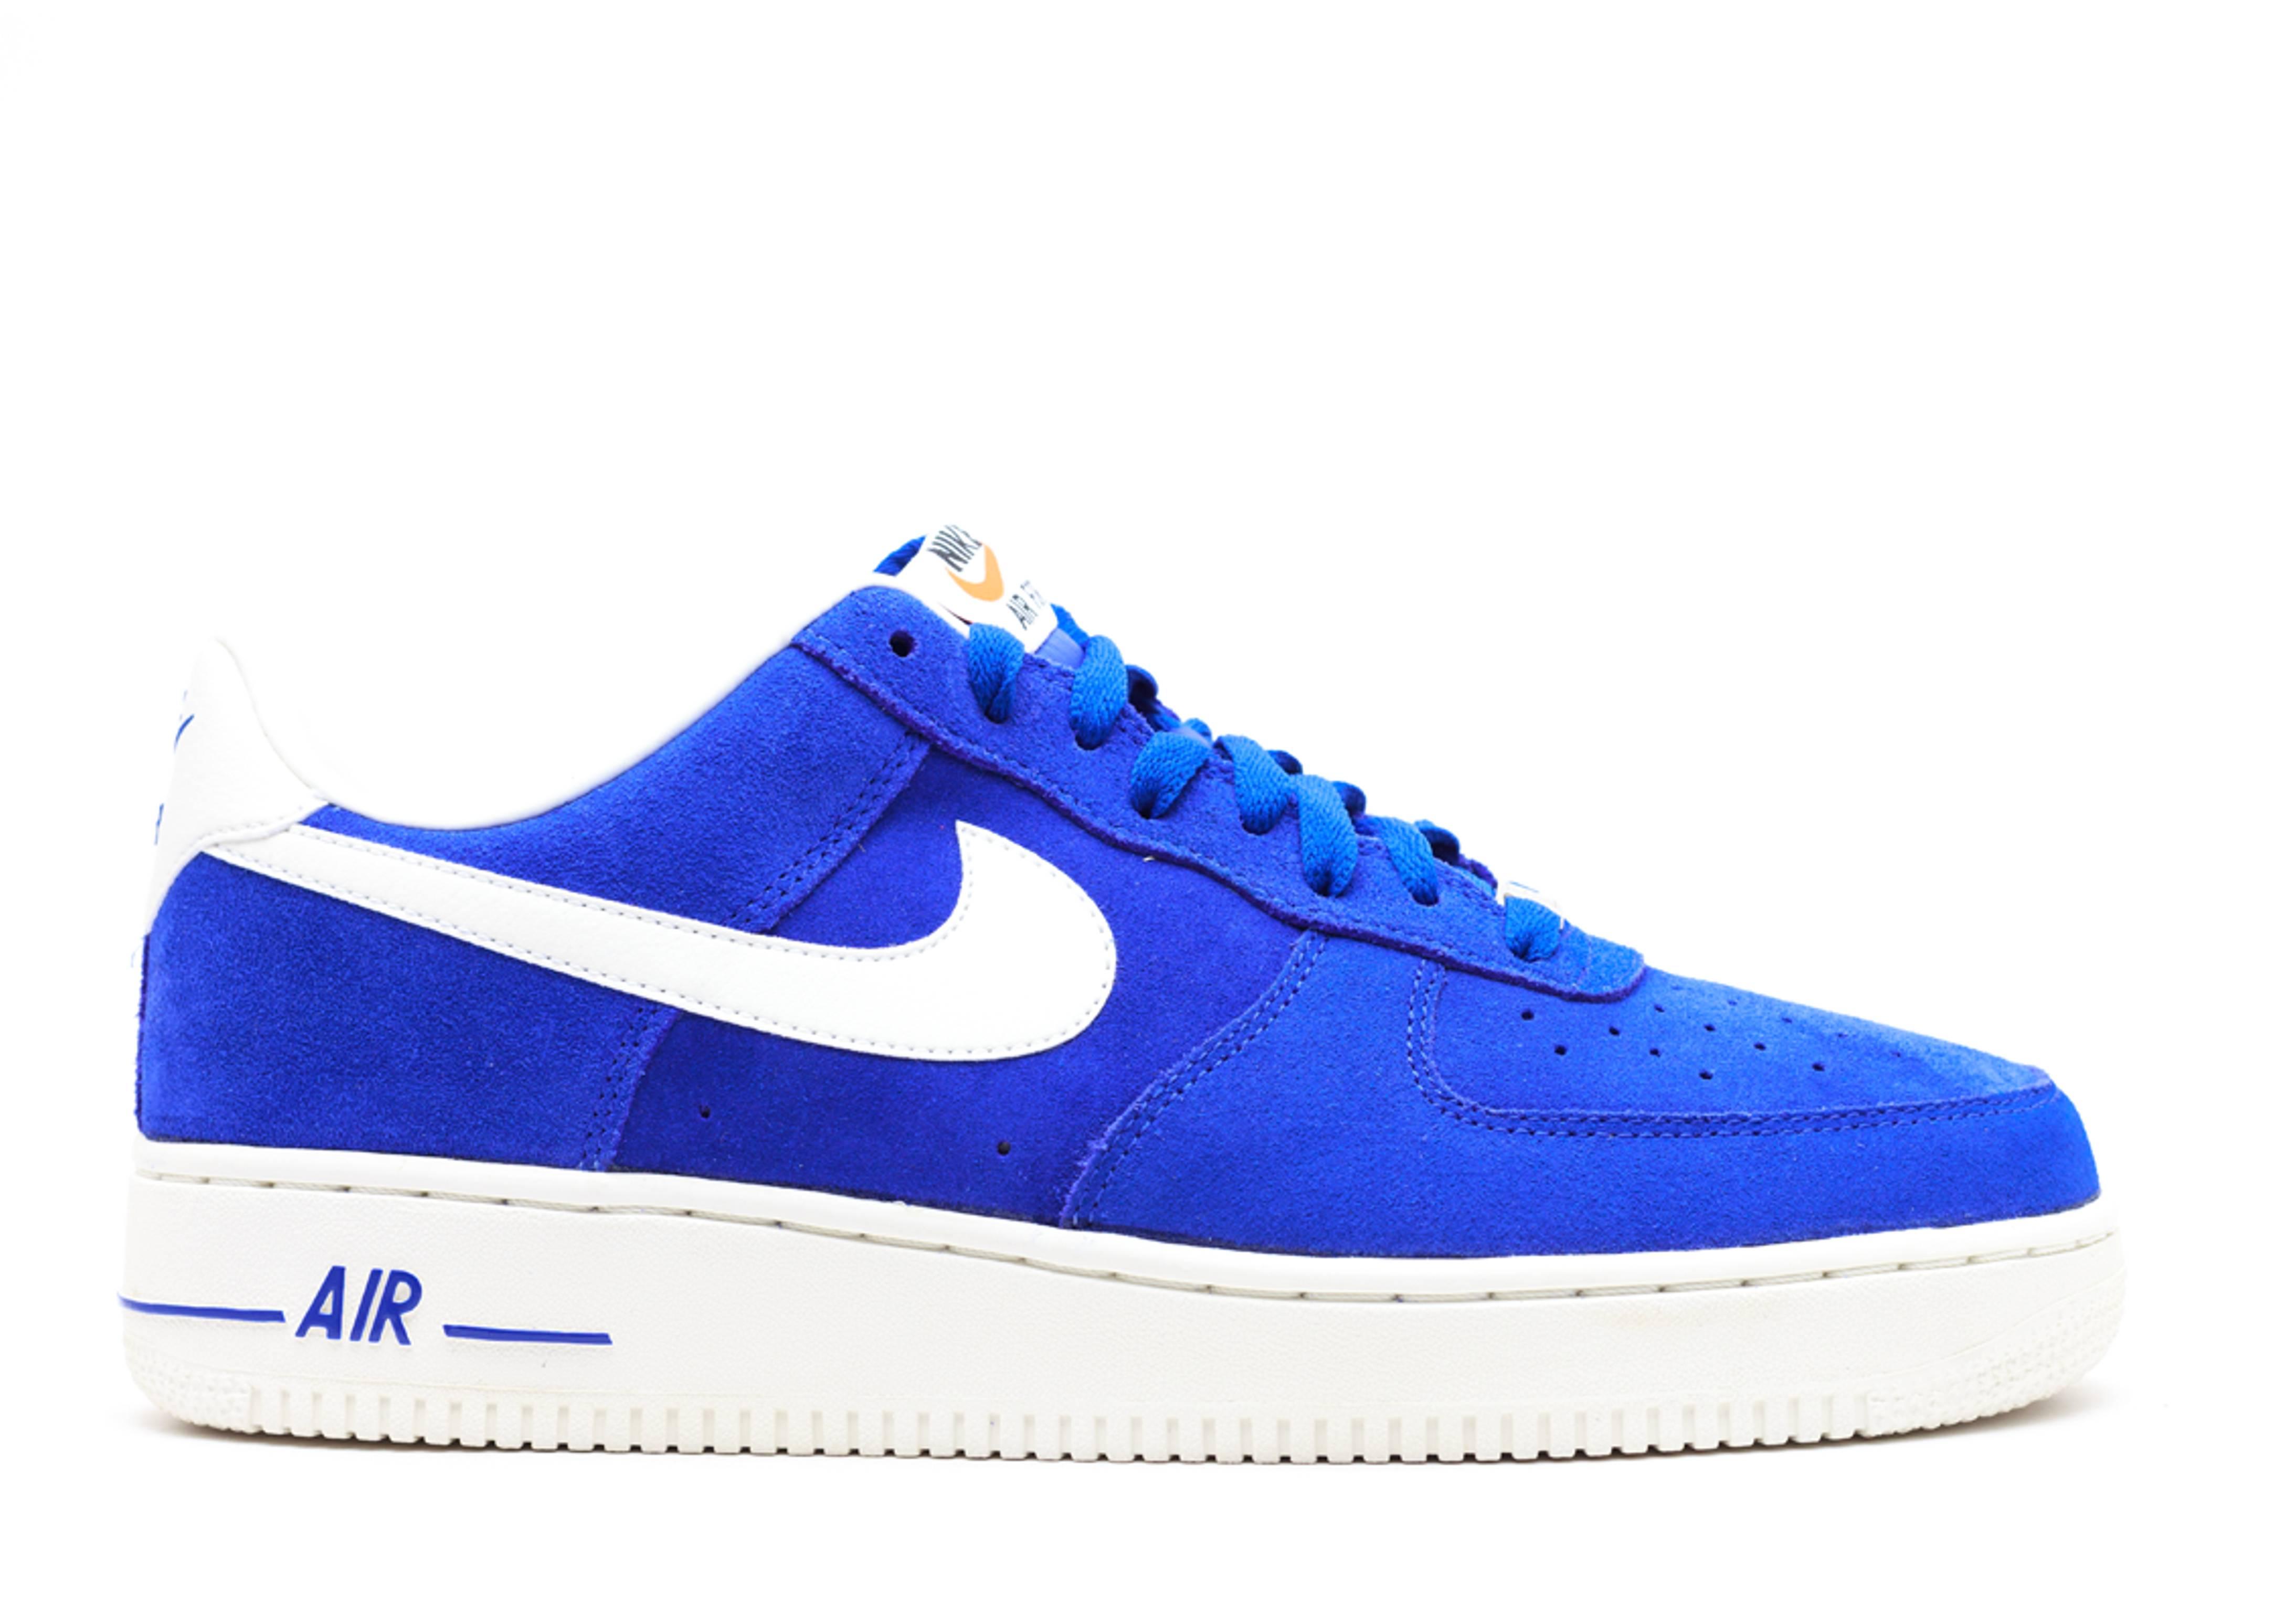 Nike Air Force 1 Blazer Pack Hyper Blue